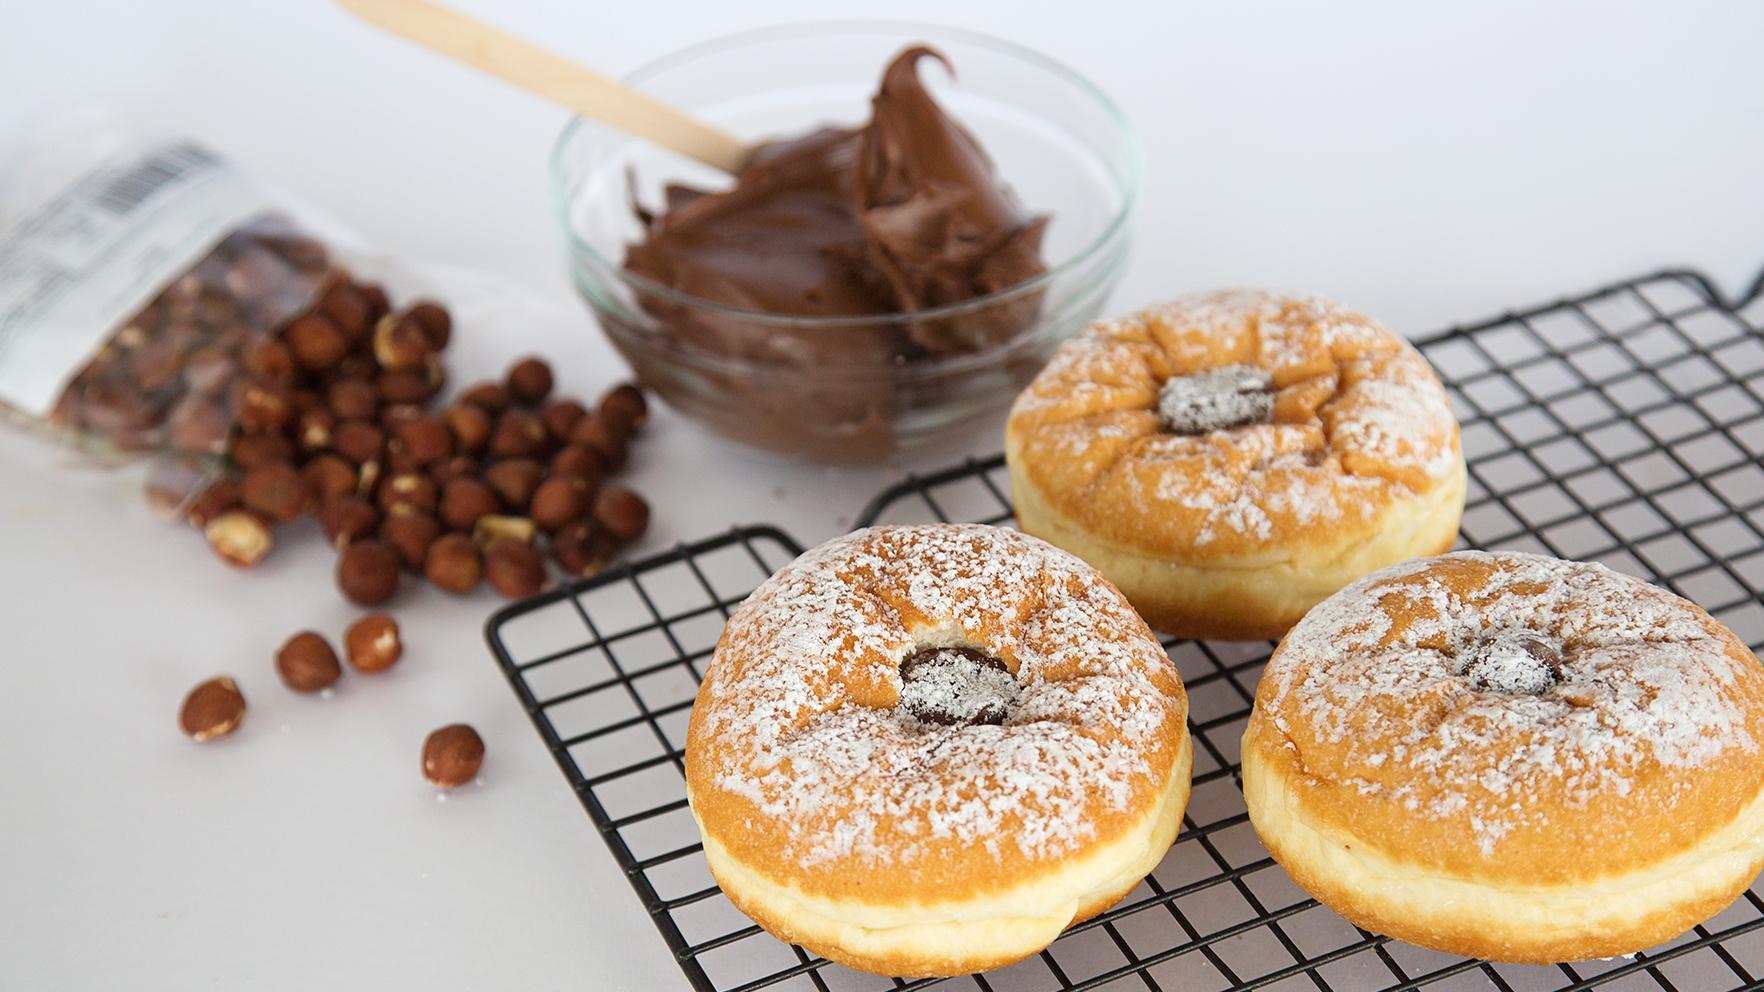 Choc_Donuts.jpg